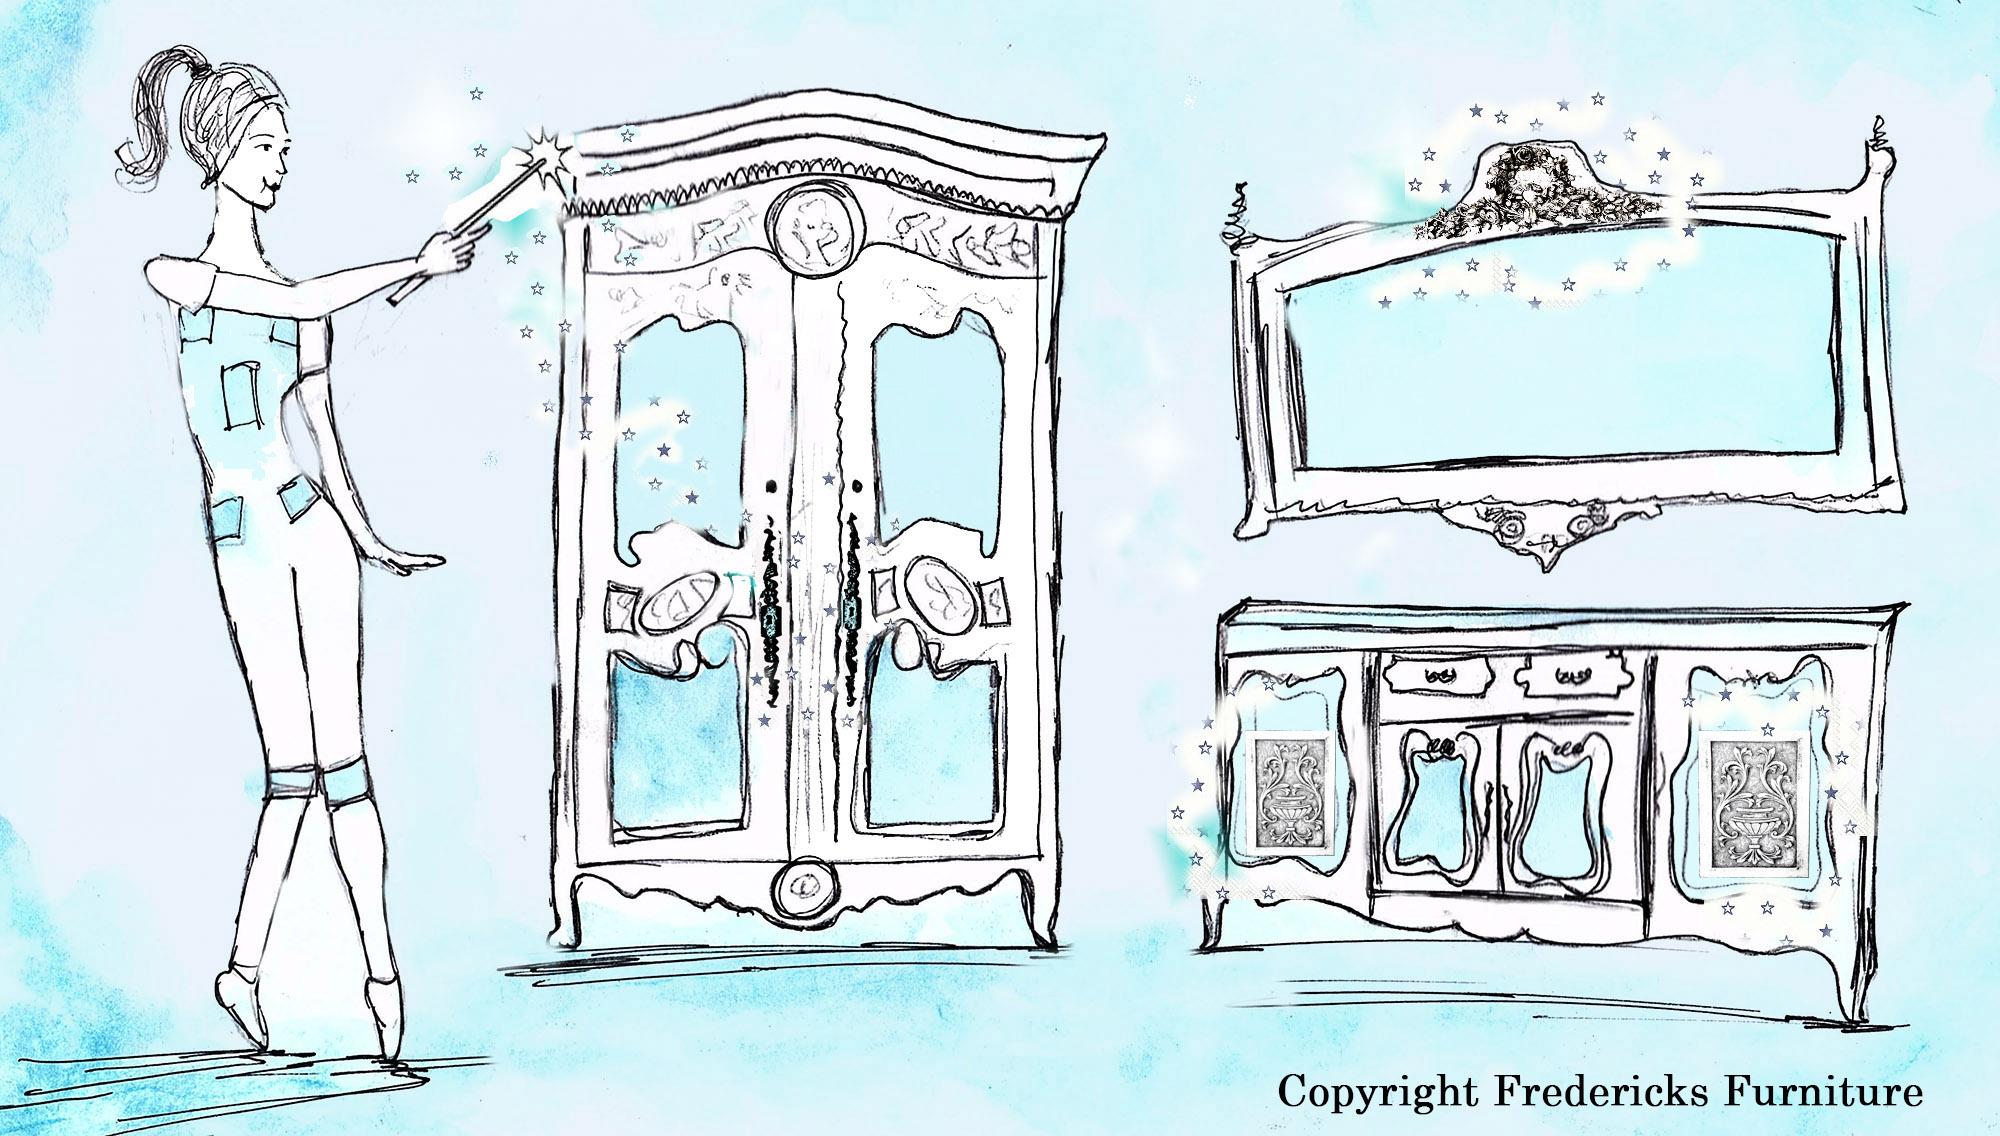 Fredericks Furniture